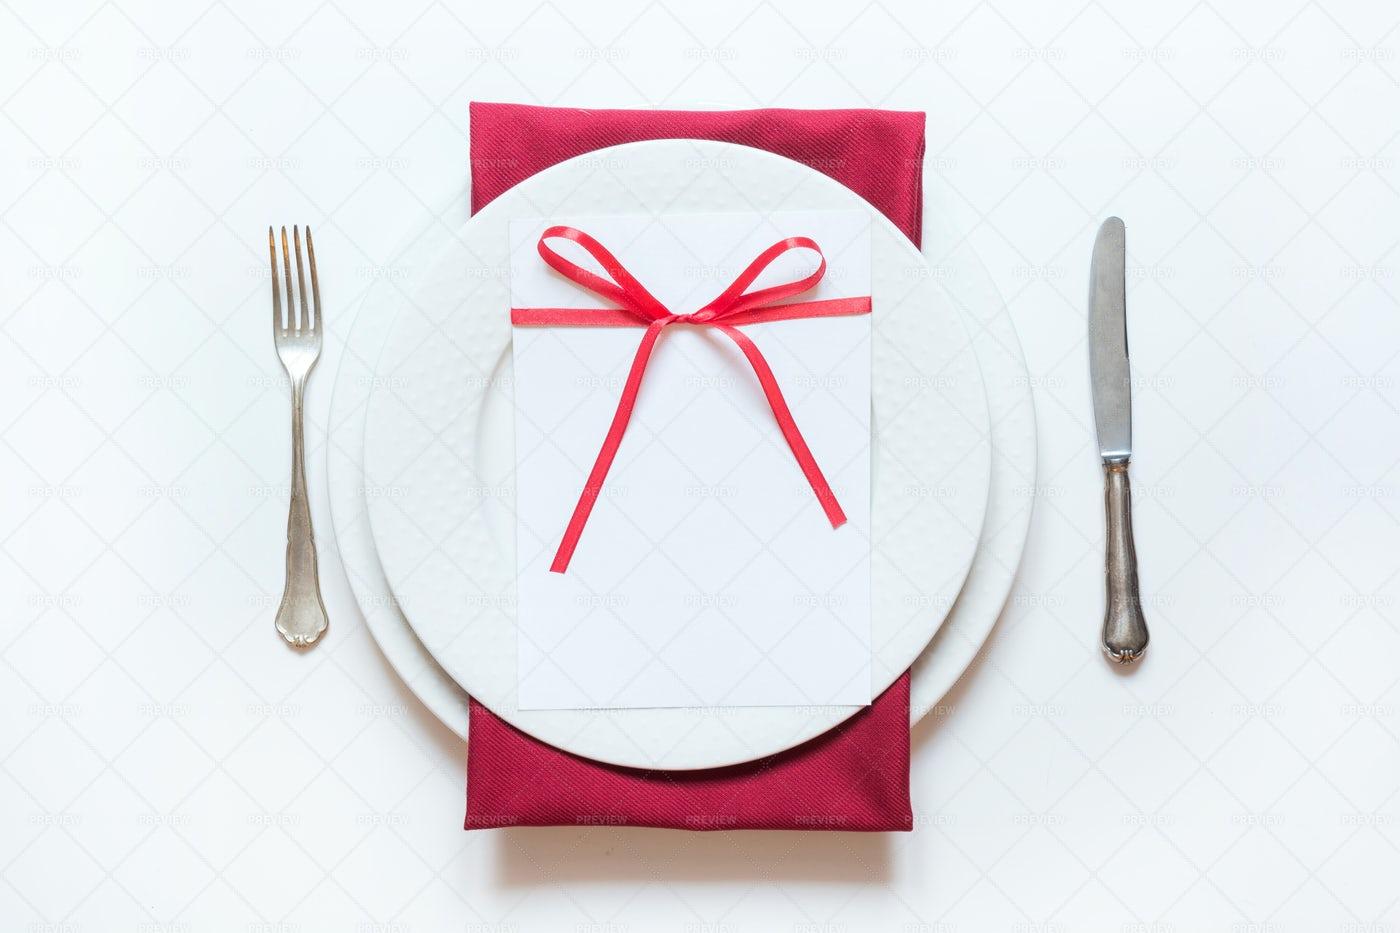 Dinner Celebration: Stock Photos